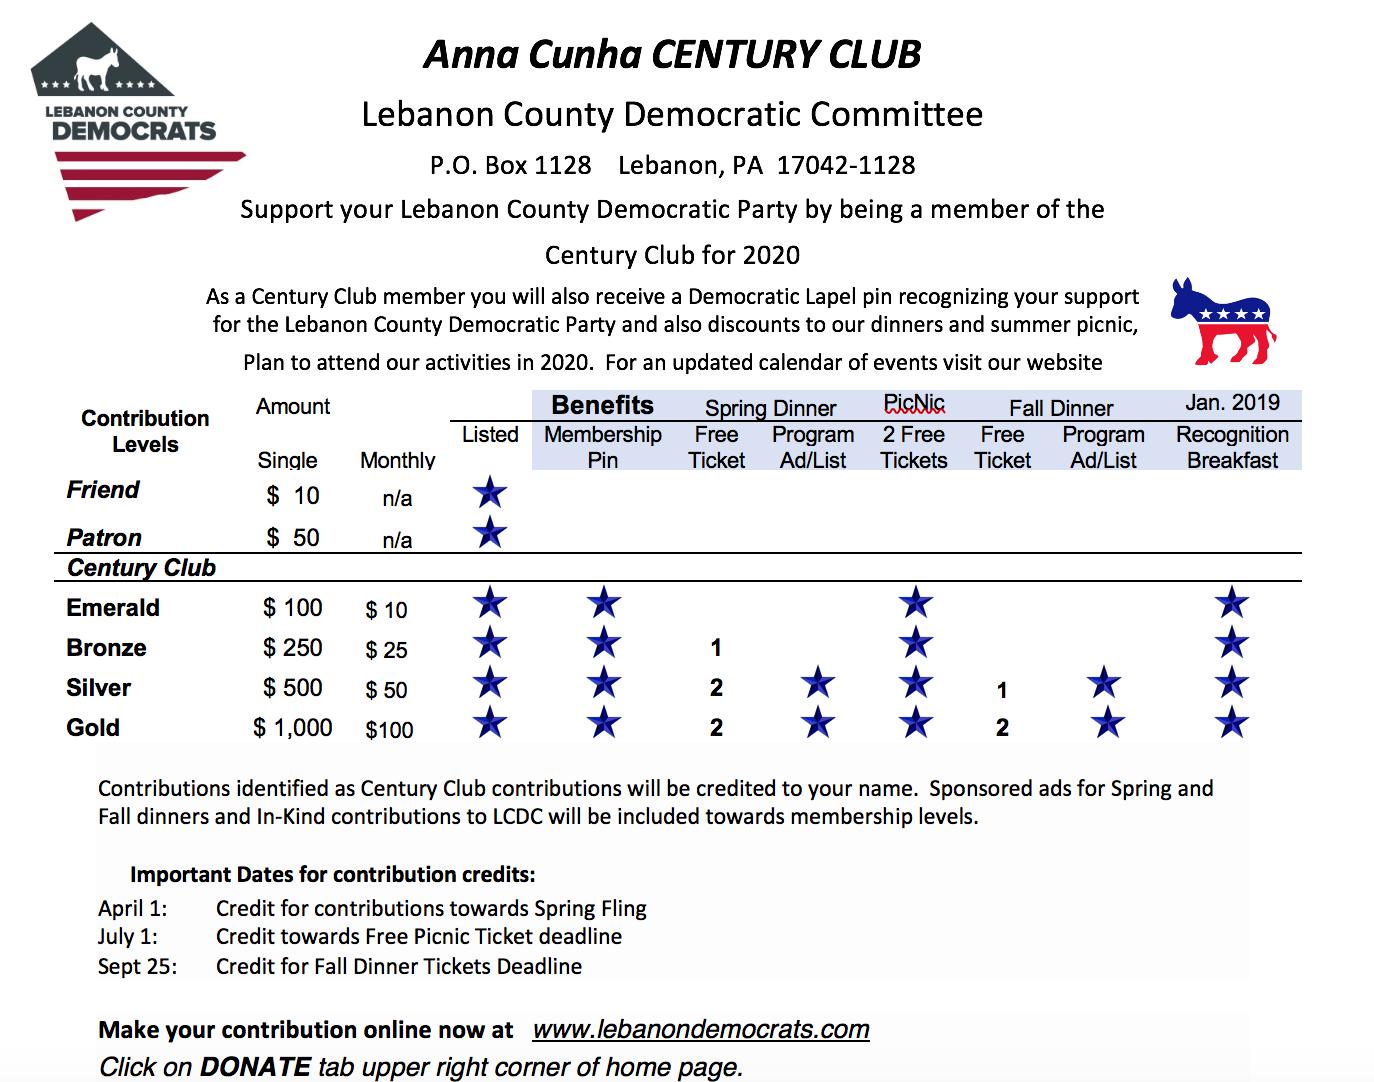 AC Century Club